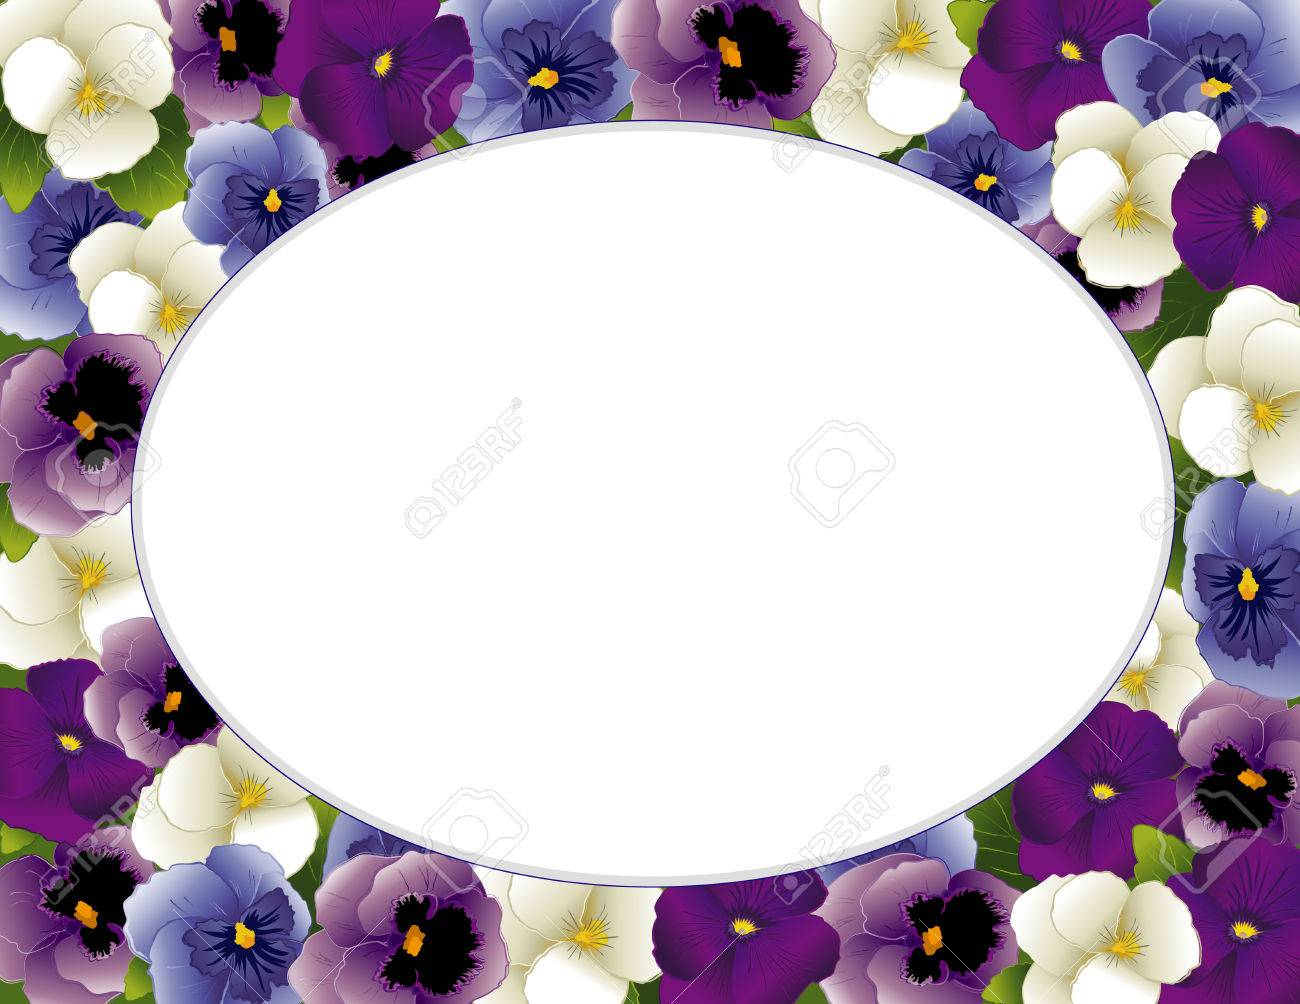 Pansy-Blumen-Oval Bilderrahmen Frühling Bratschen In Lavendel, Lila ...